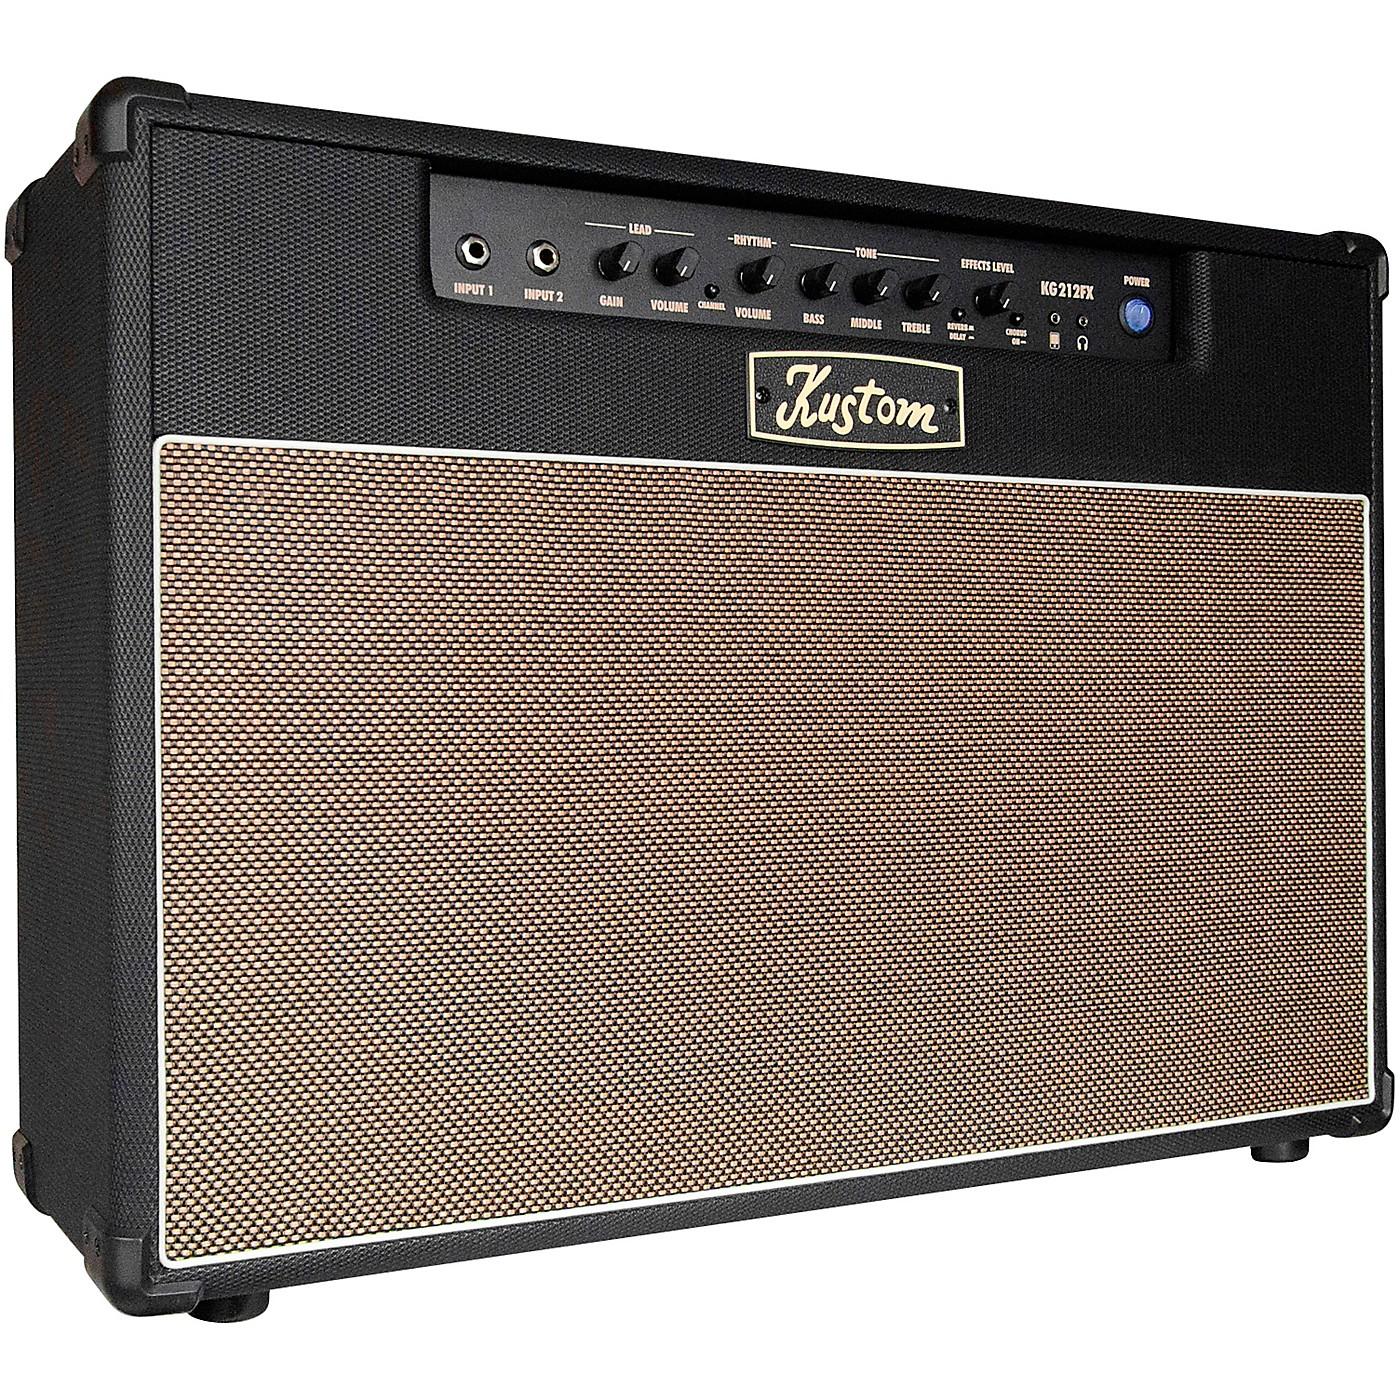 Kustom KG212FX 30W 2x12 Guitar Combo Amp thumbnail